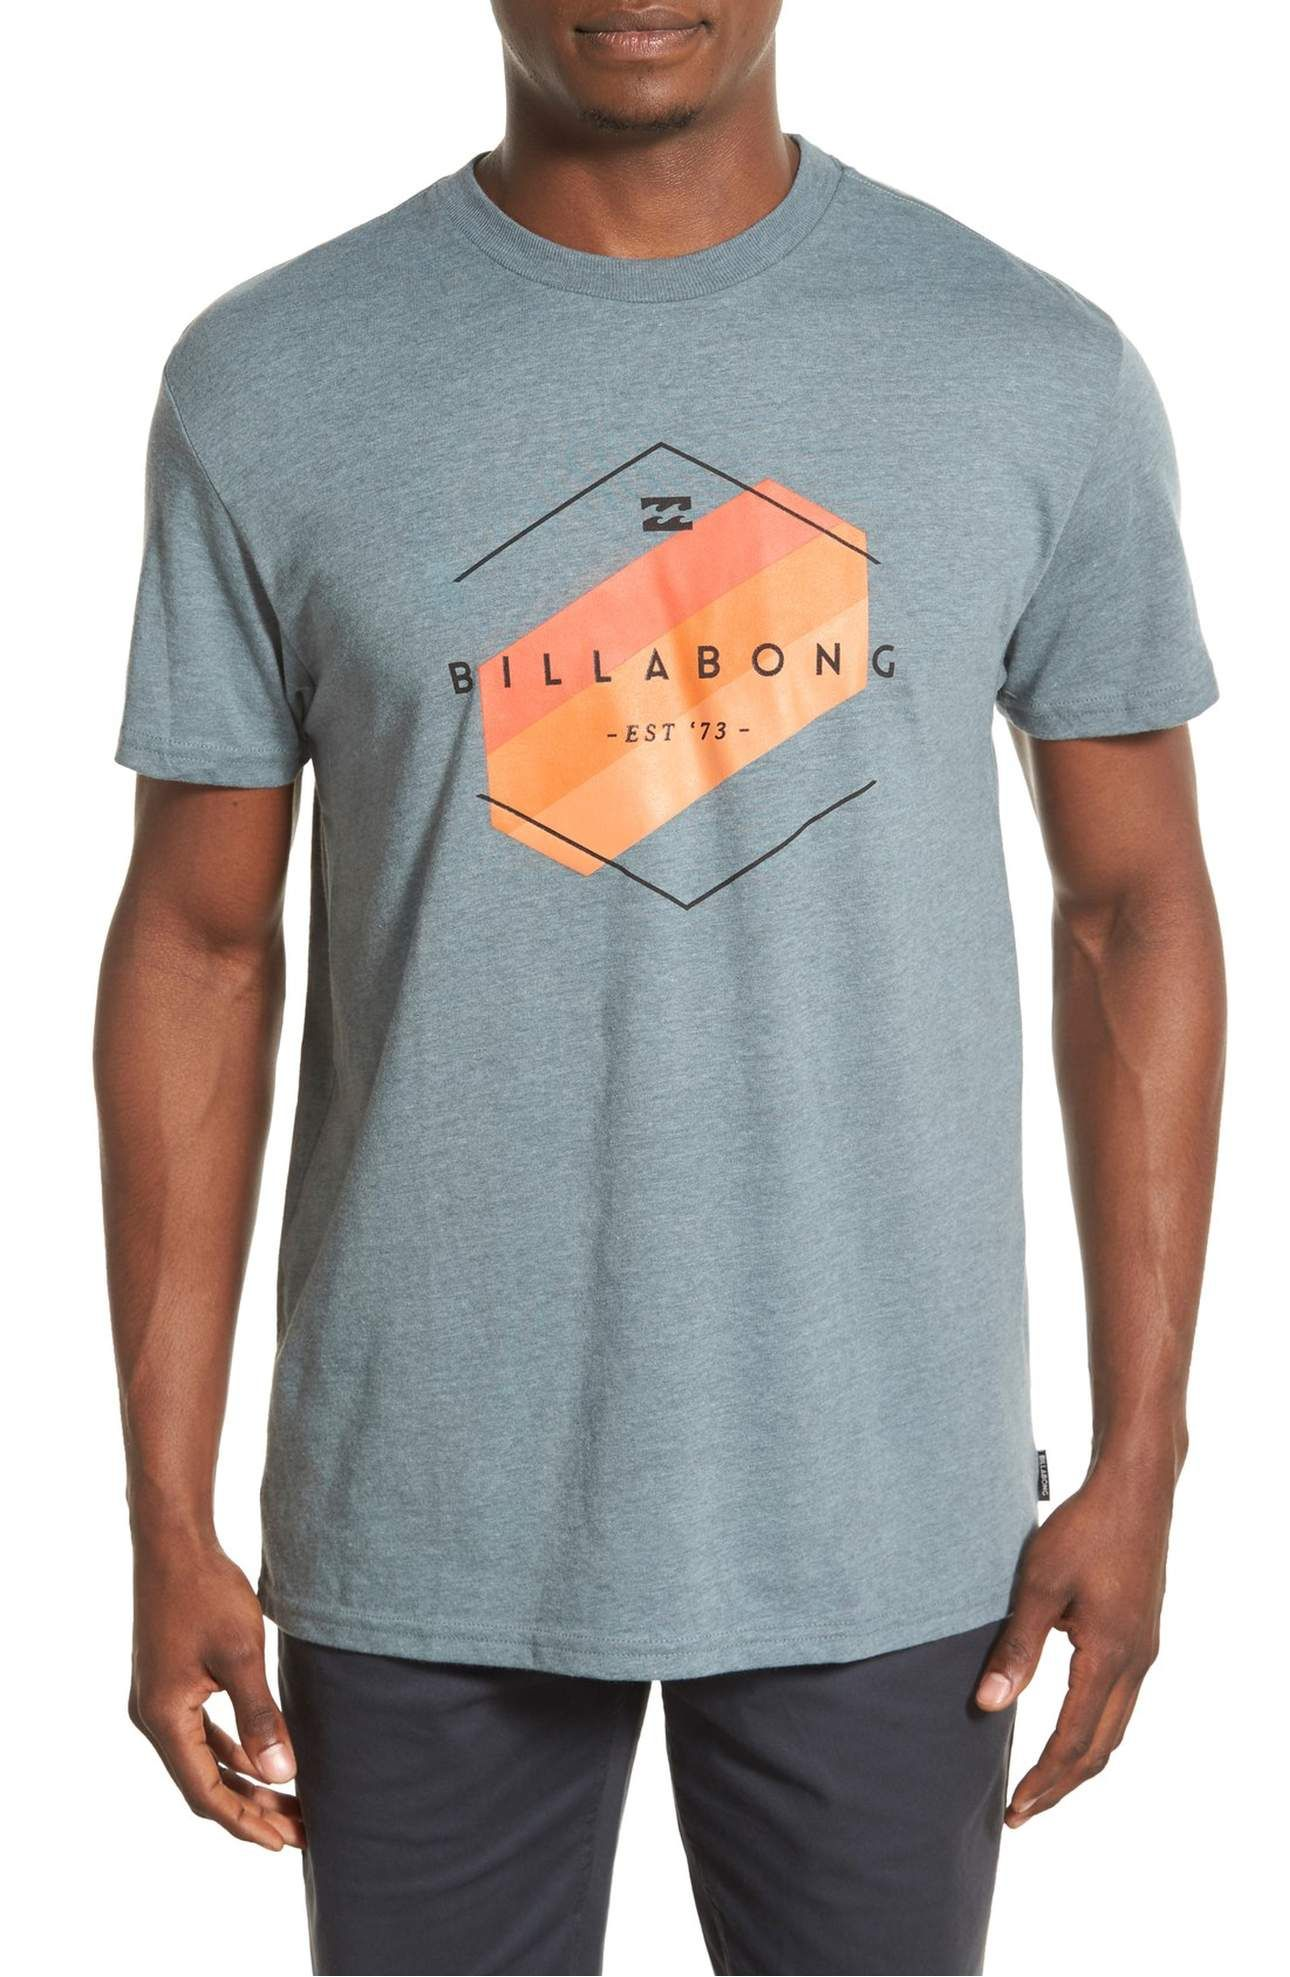 Algebra powder Delegation  Product Image 1 | Shirt designs, New t shirt design, Shirt logo design